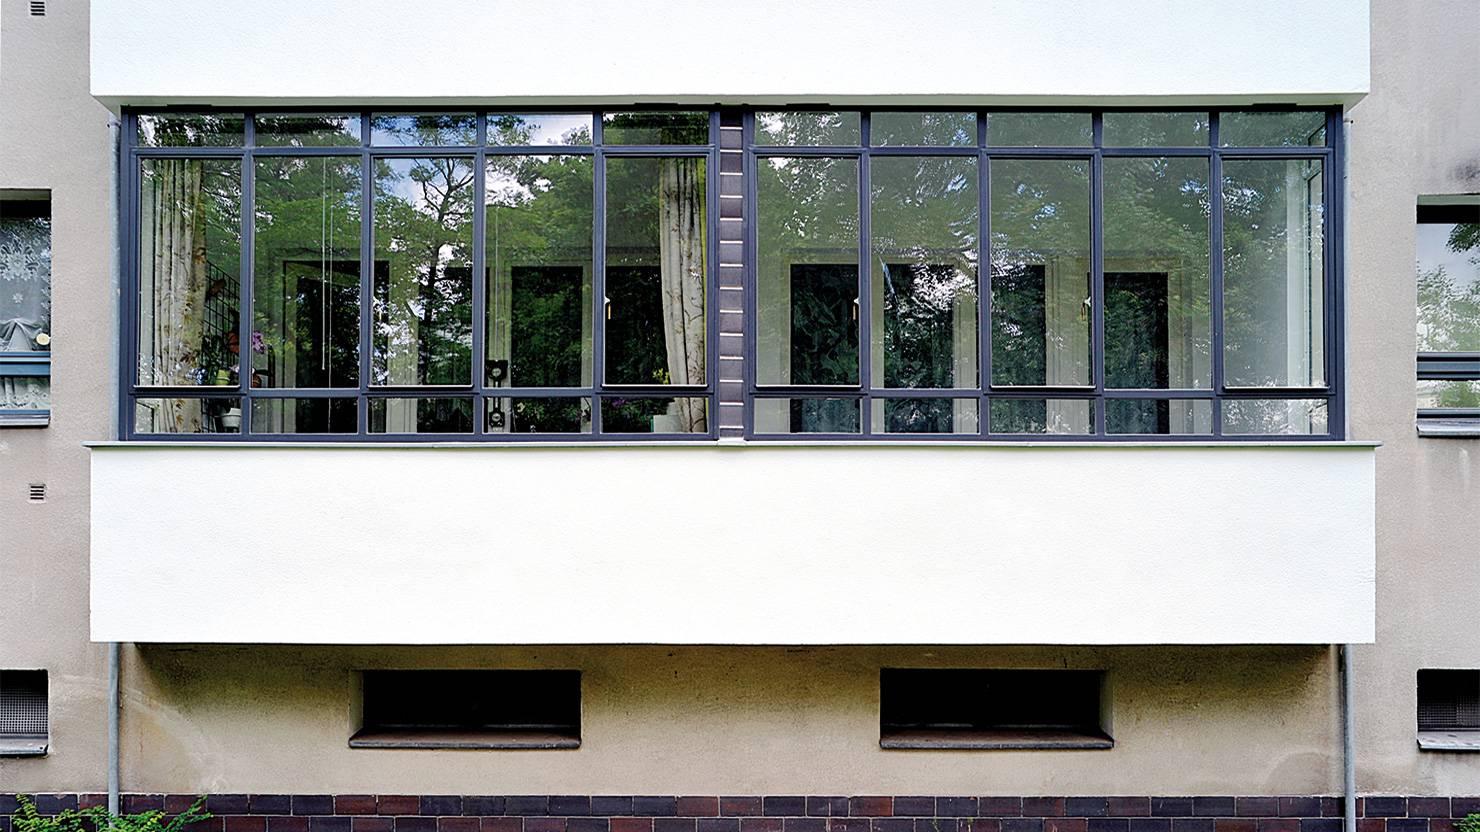 acciaio-zincato-serramenti-winfried-brenne-siemensstadt-4_project_big